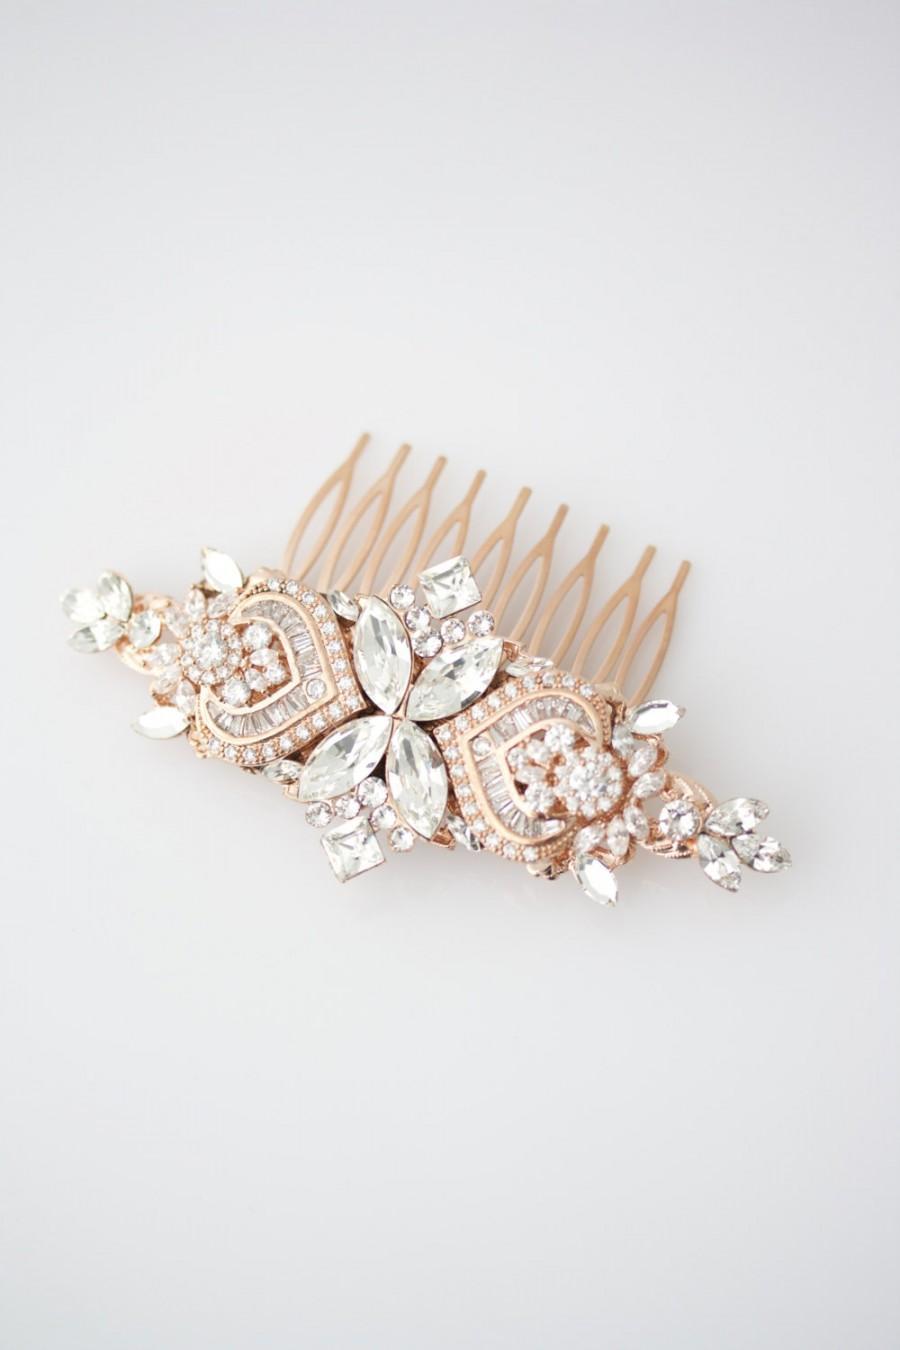 Rose gold wedding hair accessories - Wedding Hair Accessories Rose Gold Hair Comb Crystal Bridal Comb Rose Gold Headpiece Wedding Headpiece Rhinestone Comb Evie